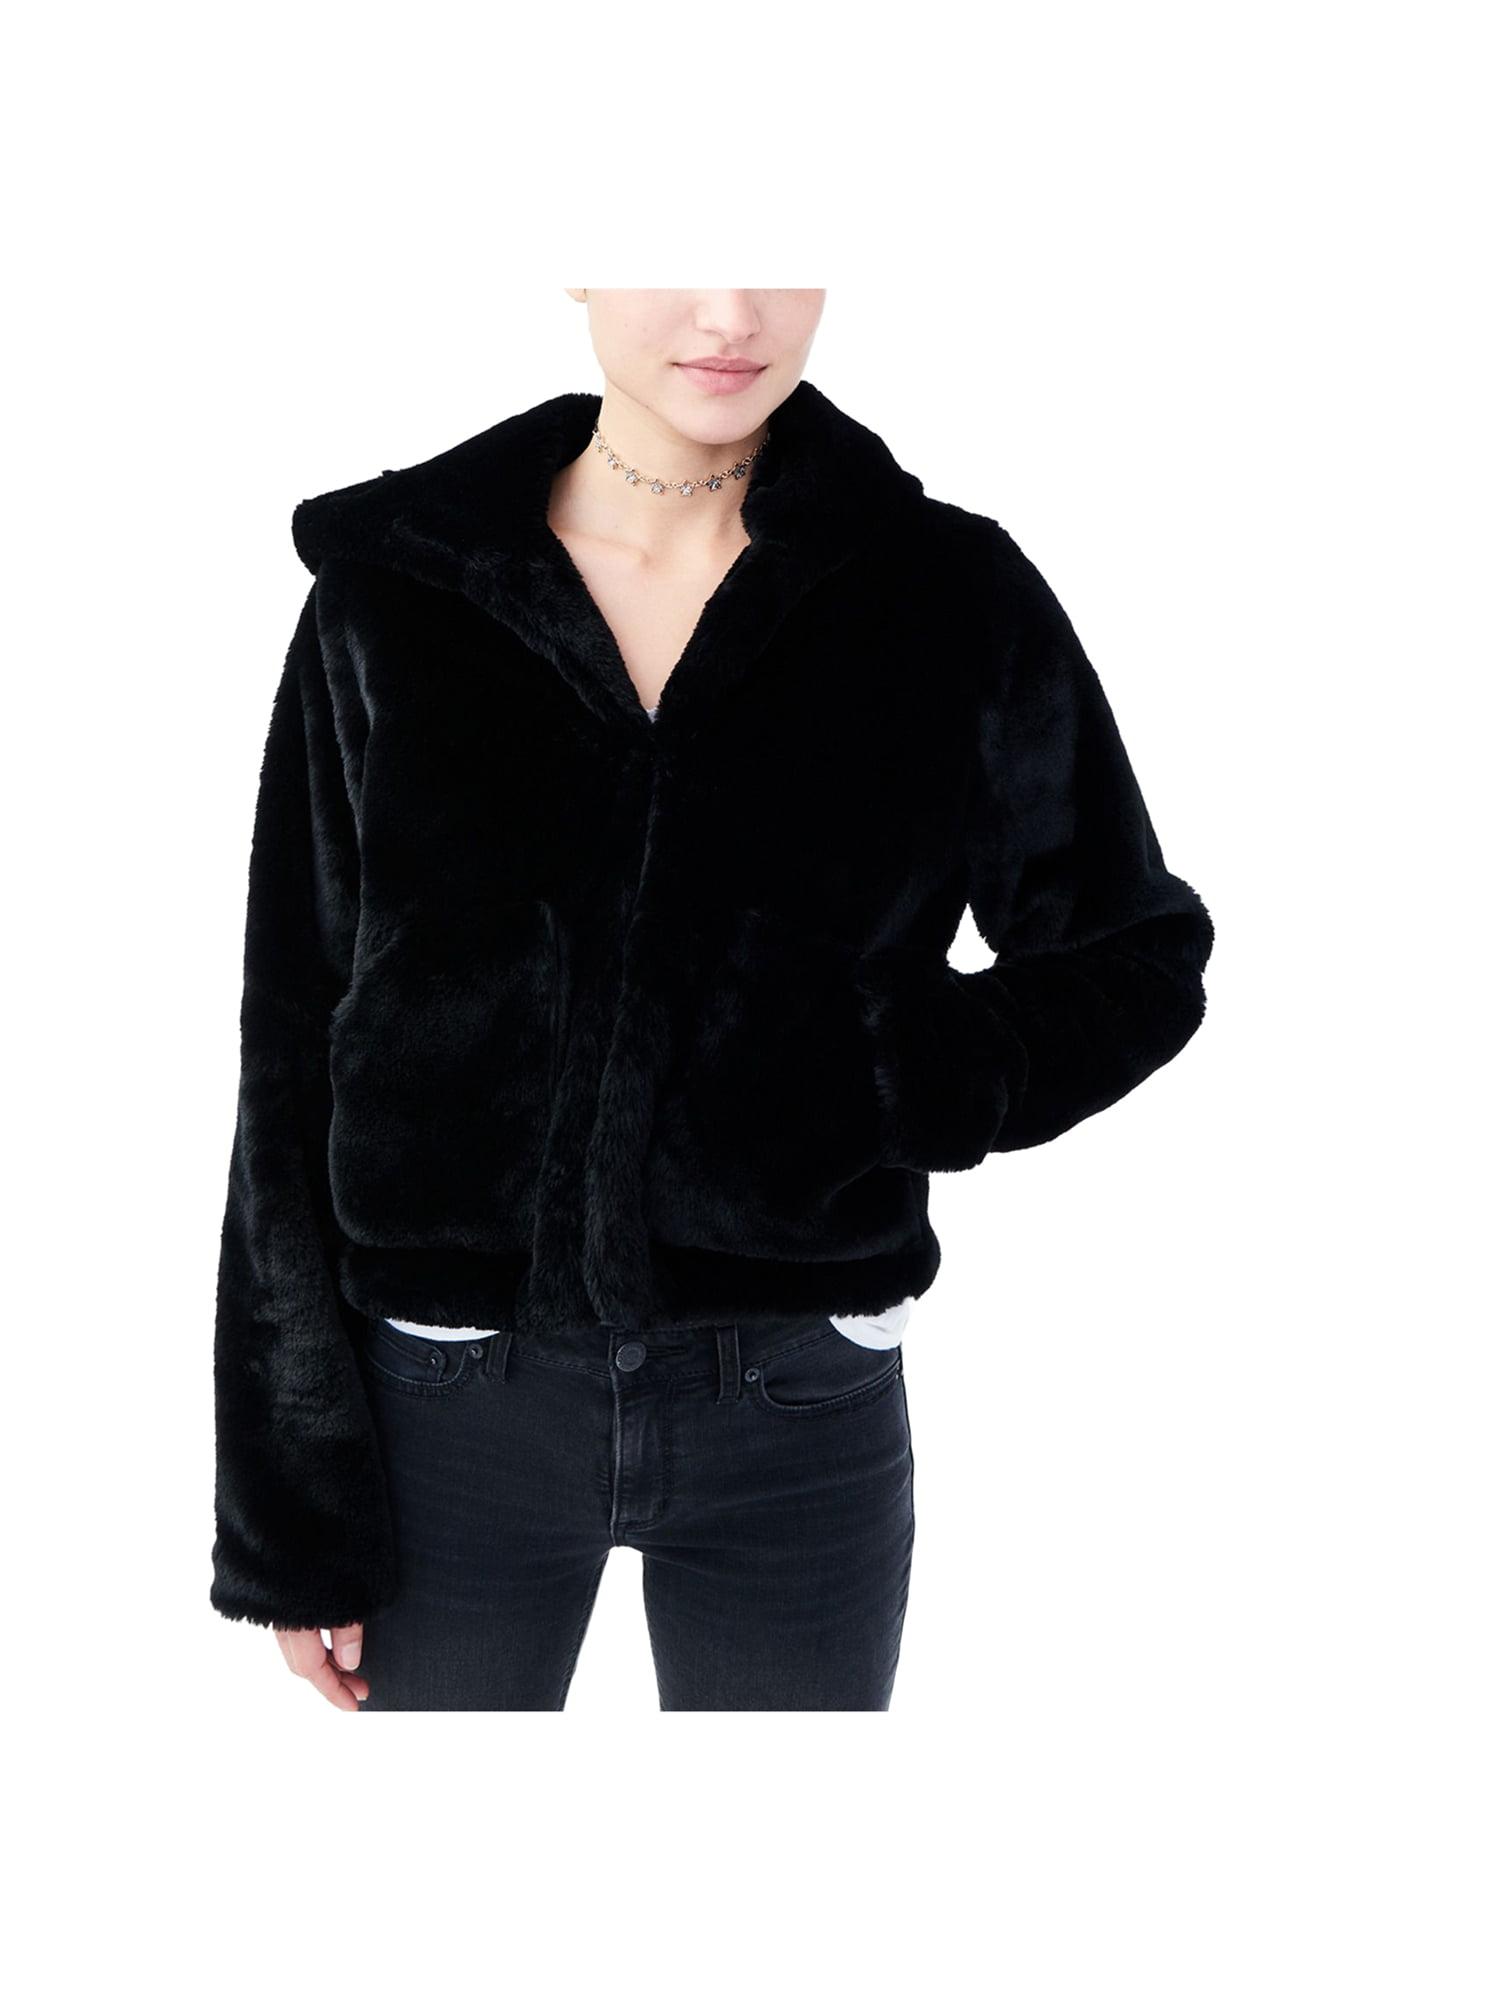 Aeropostale Juniors Faux Fur Jacket